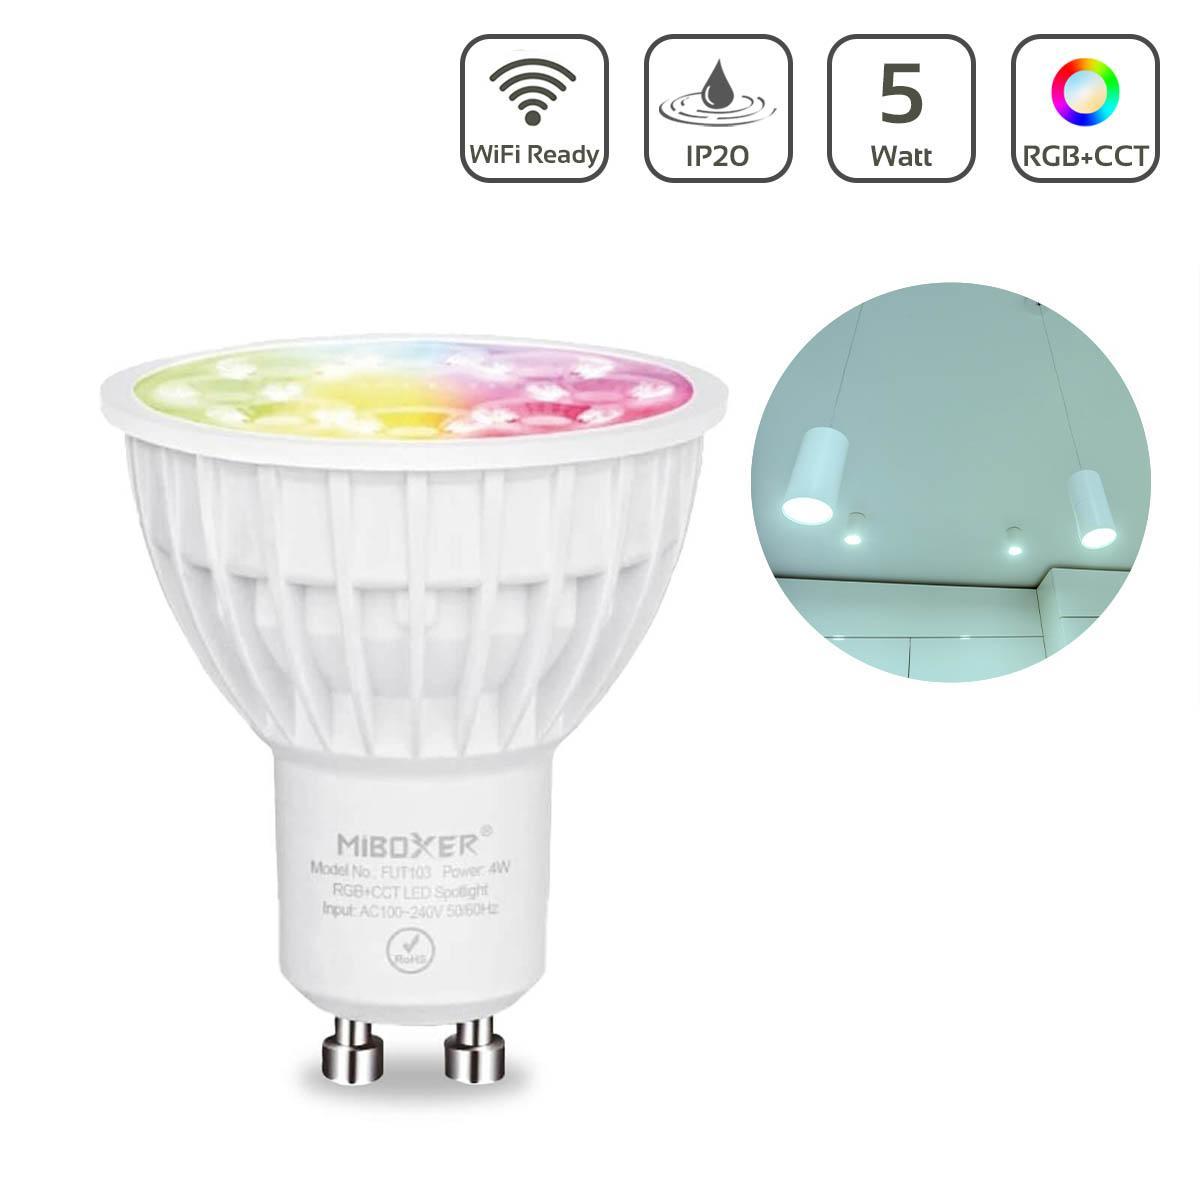 MiBoxer RGB+CCT LED Spot 4W GU10 | WiFi ready | FUT103